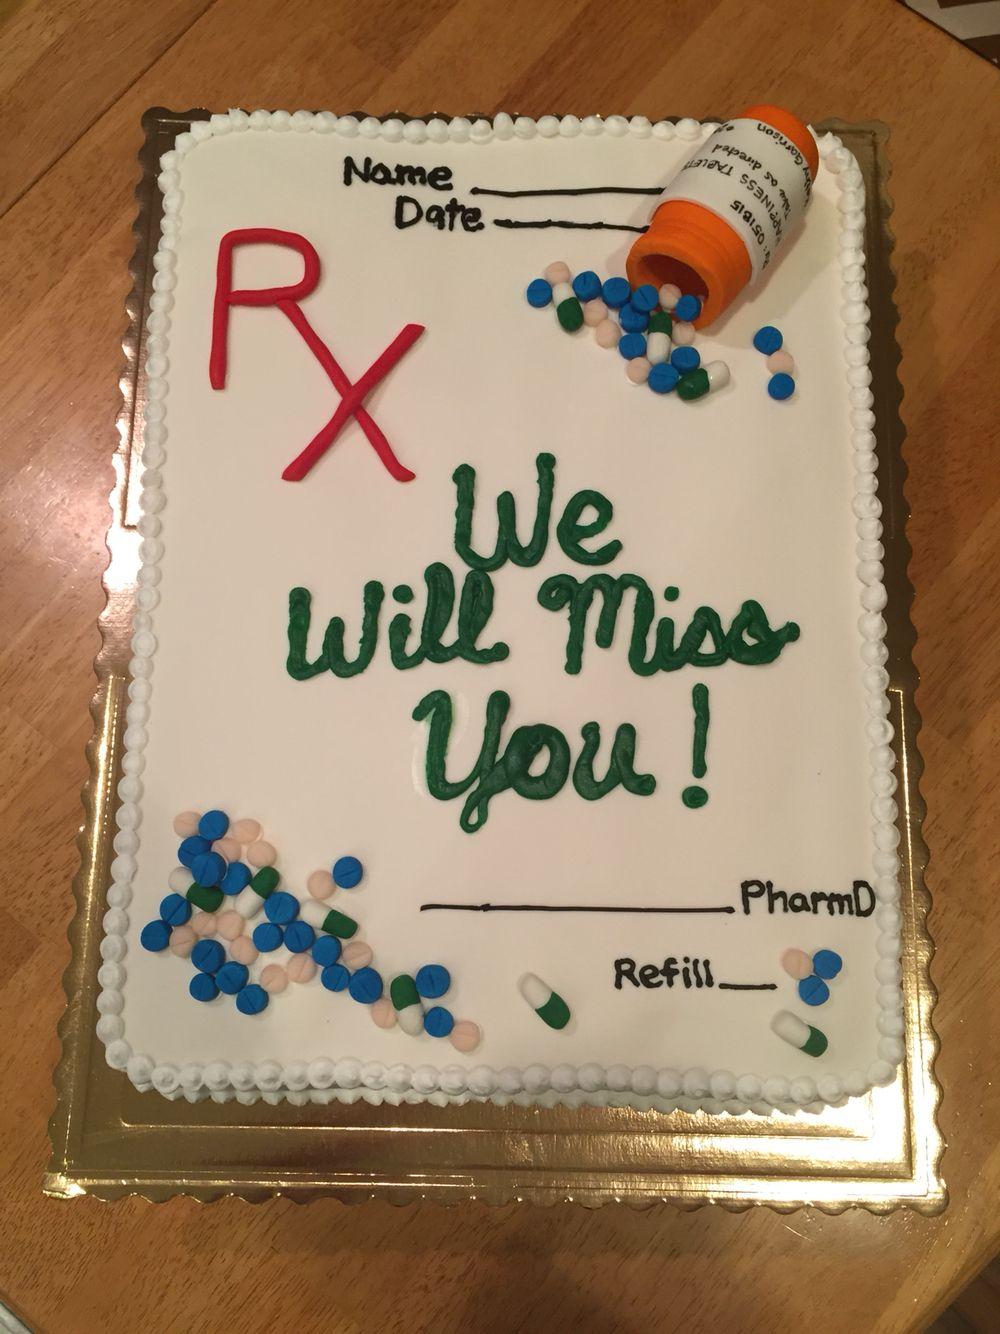 Goodbye Pharmacy Cake Retirement | Cakes I've Made ...